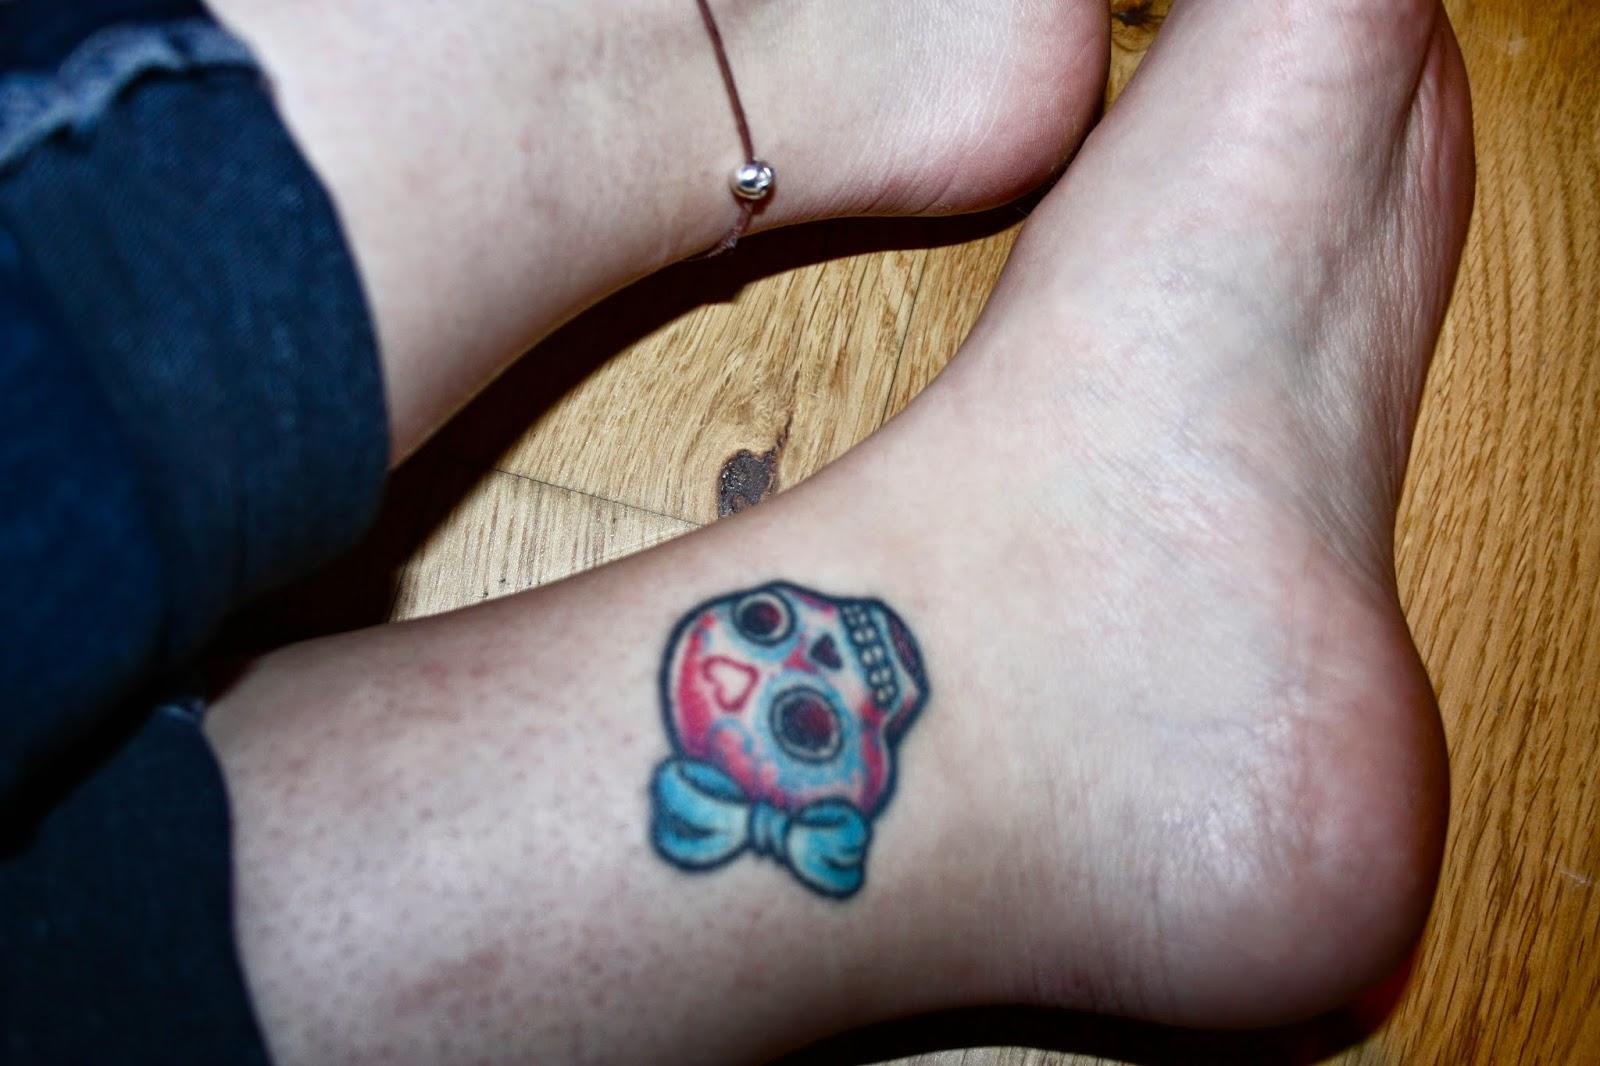 Totenkopf tattoo sugarskull dia de los muertos tattoo Totenkopf mit Schleife bunter Totenkopf Mädchentotenkopf Fußknöchel